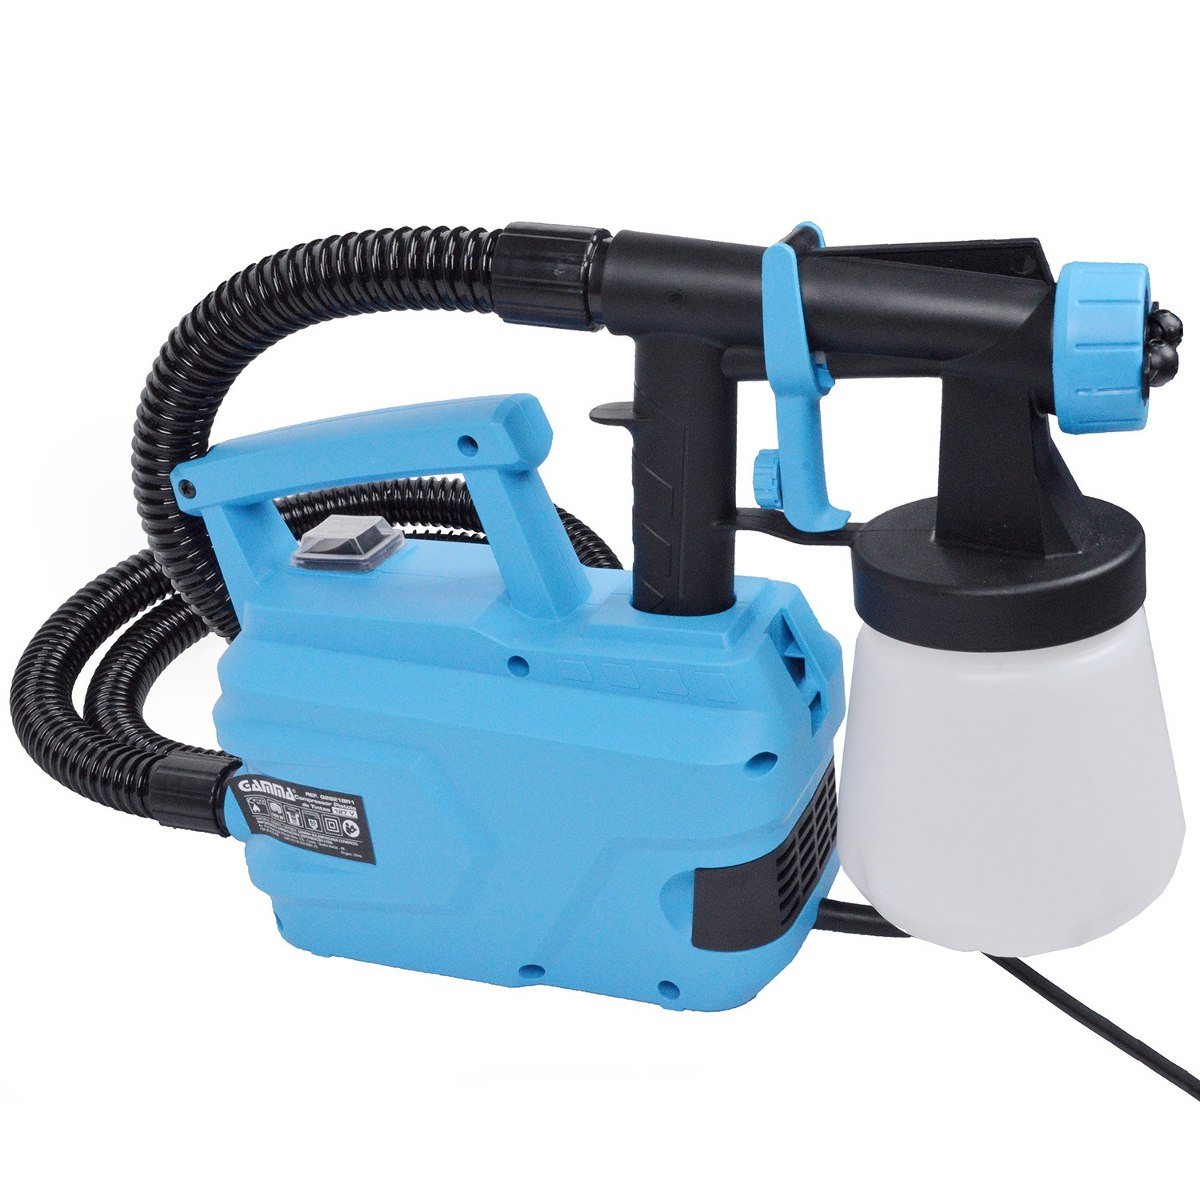 Pistola pintura compressor 500w eletrica 220v gamma g2821 - Pistola pintura compresor ...